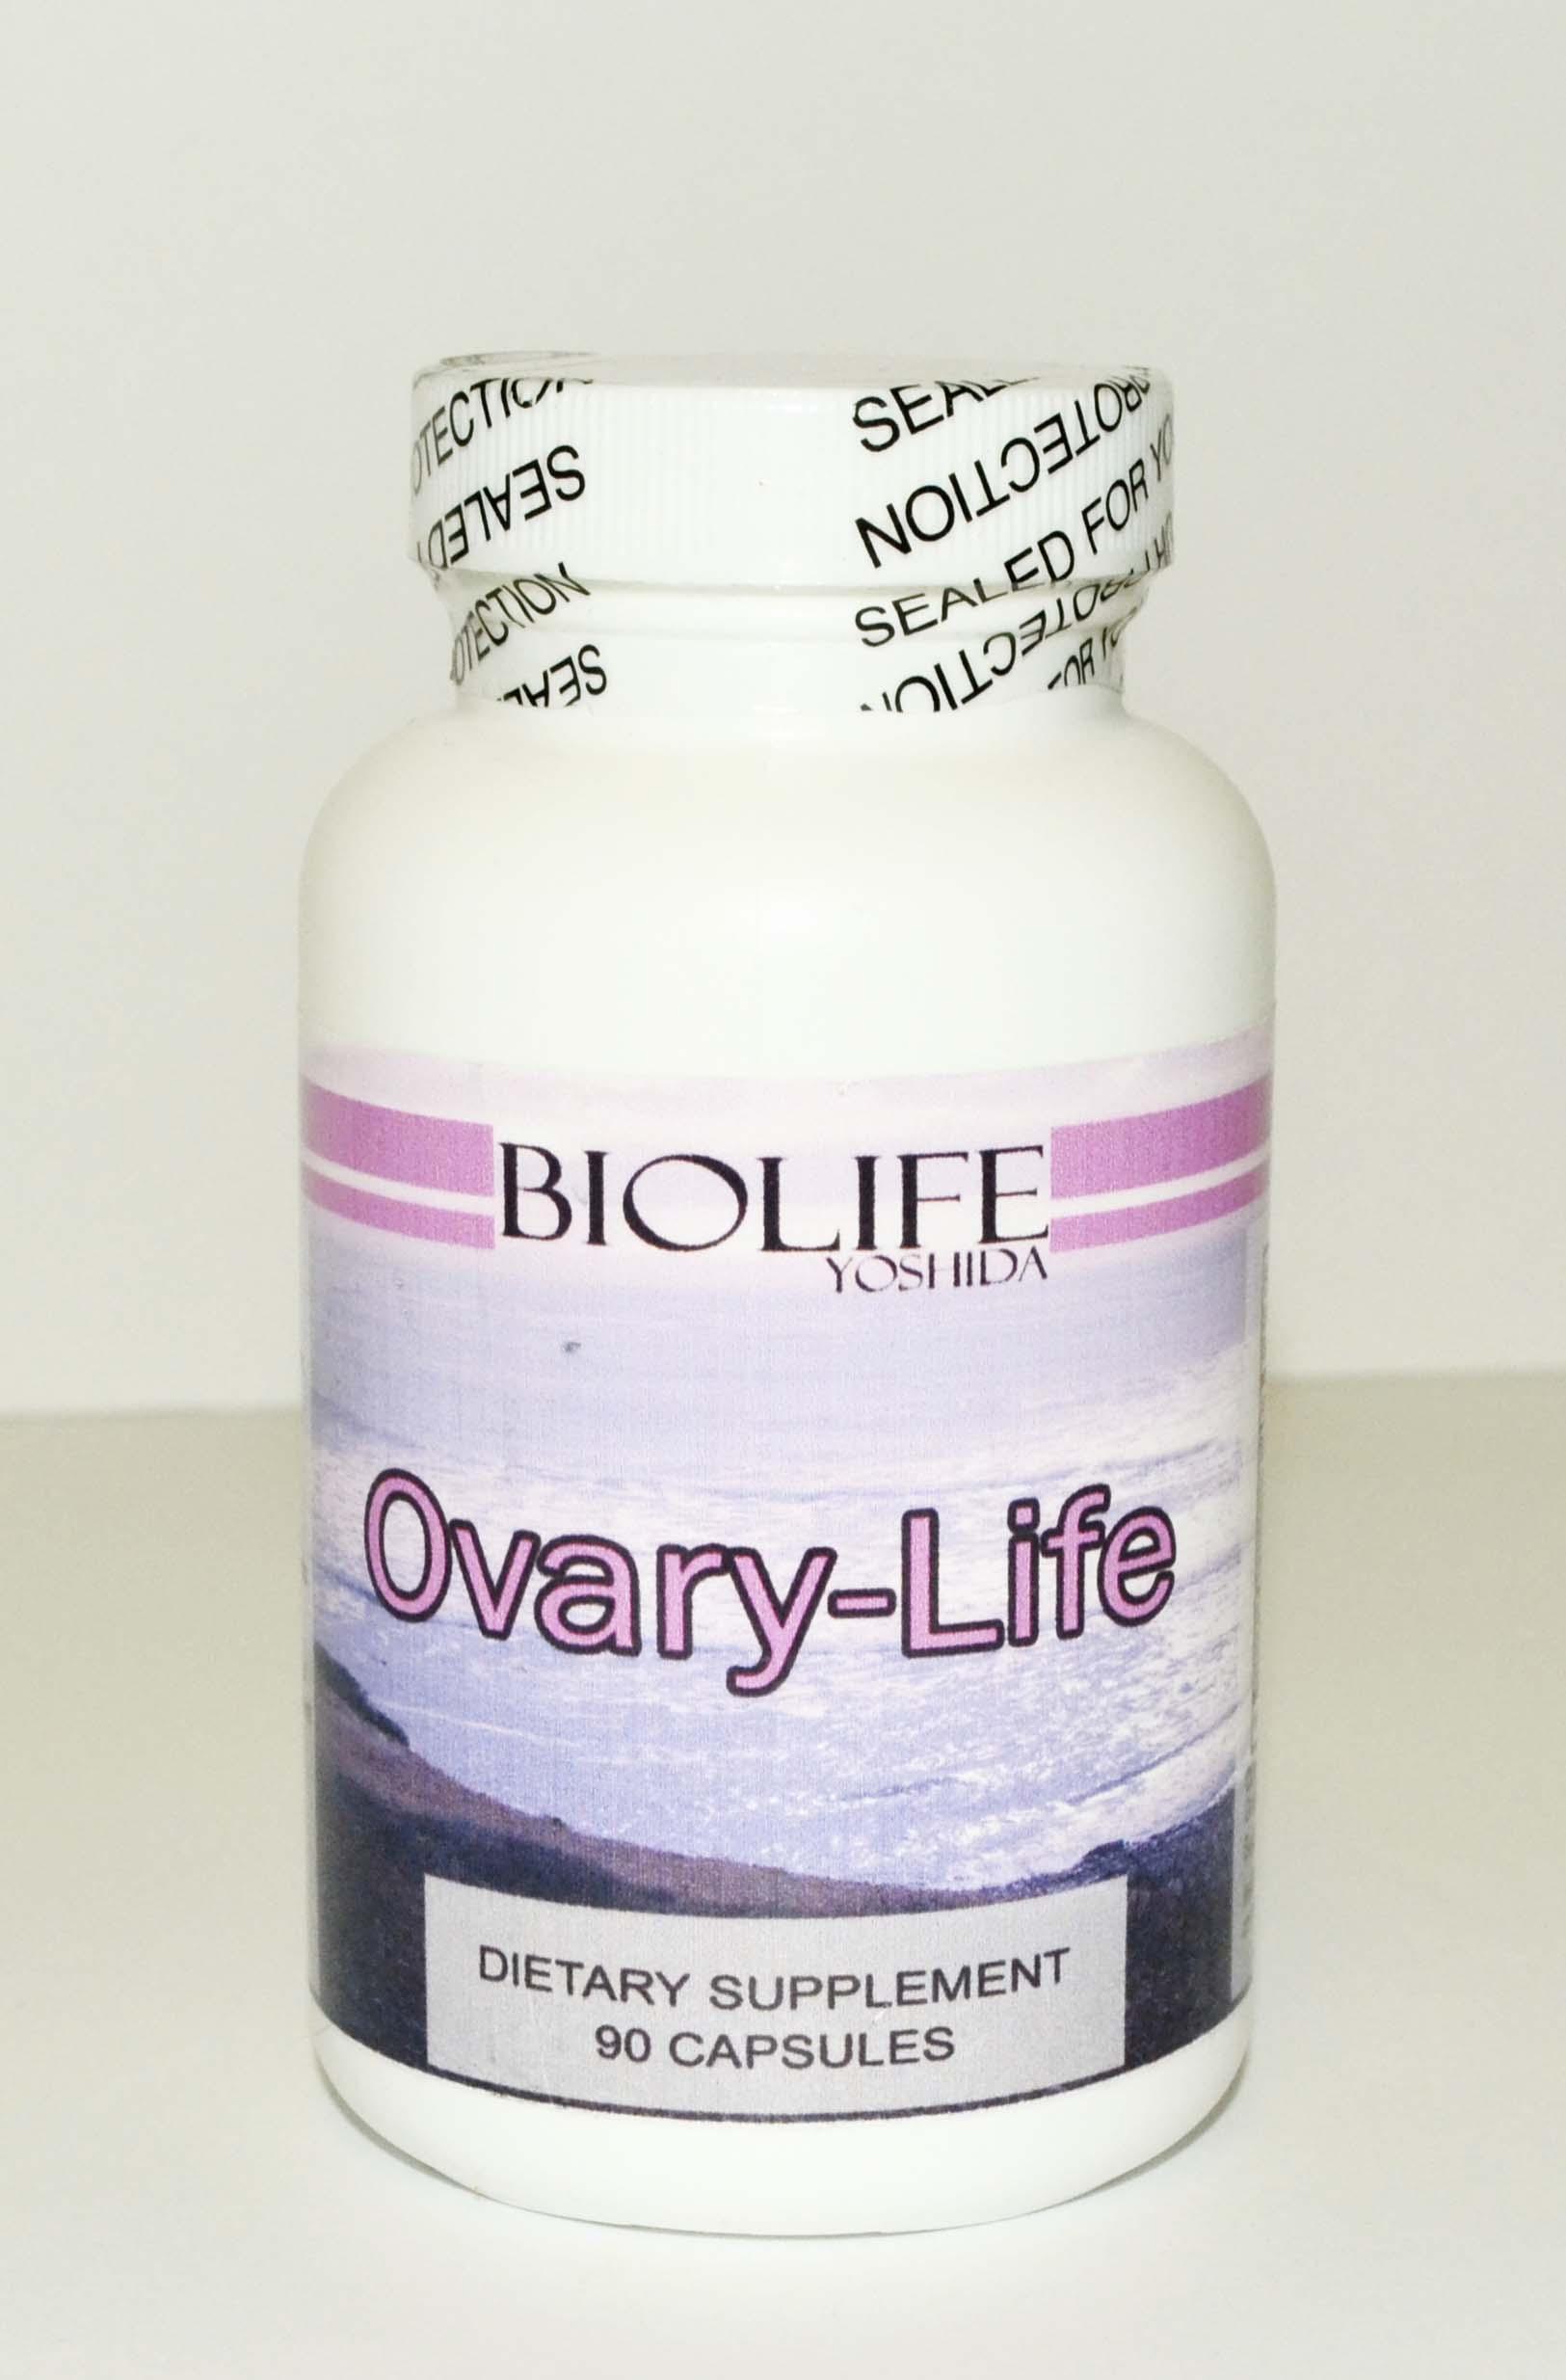 Ovary-Life